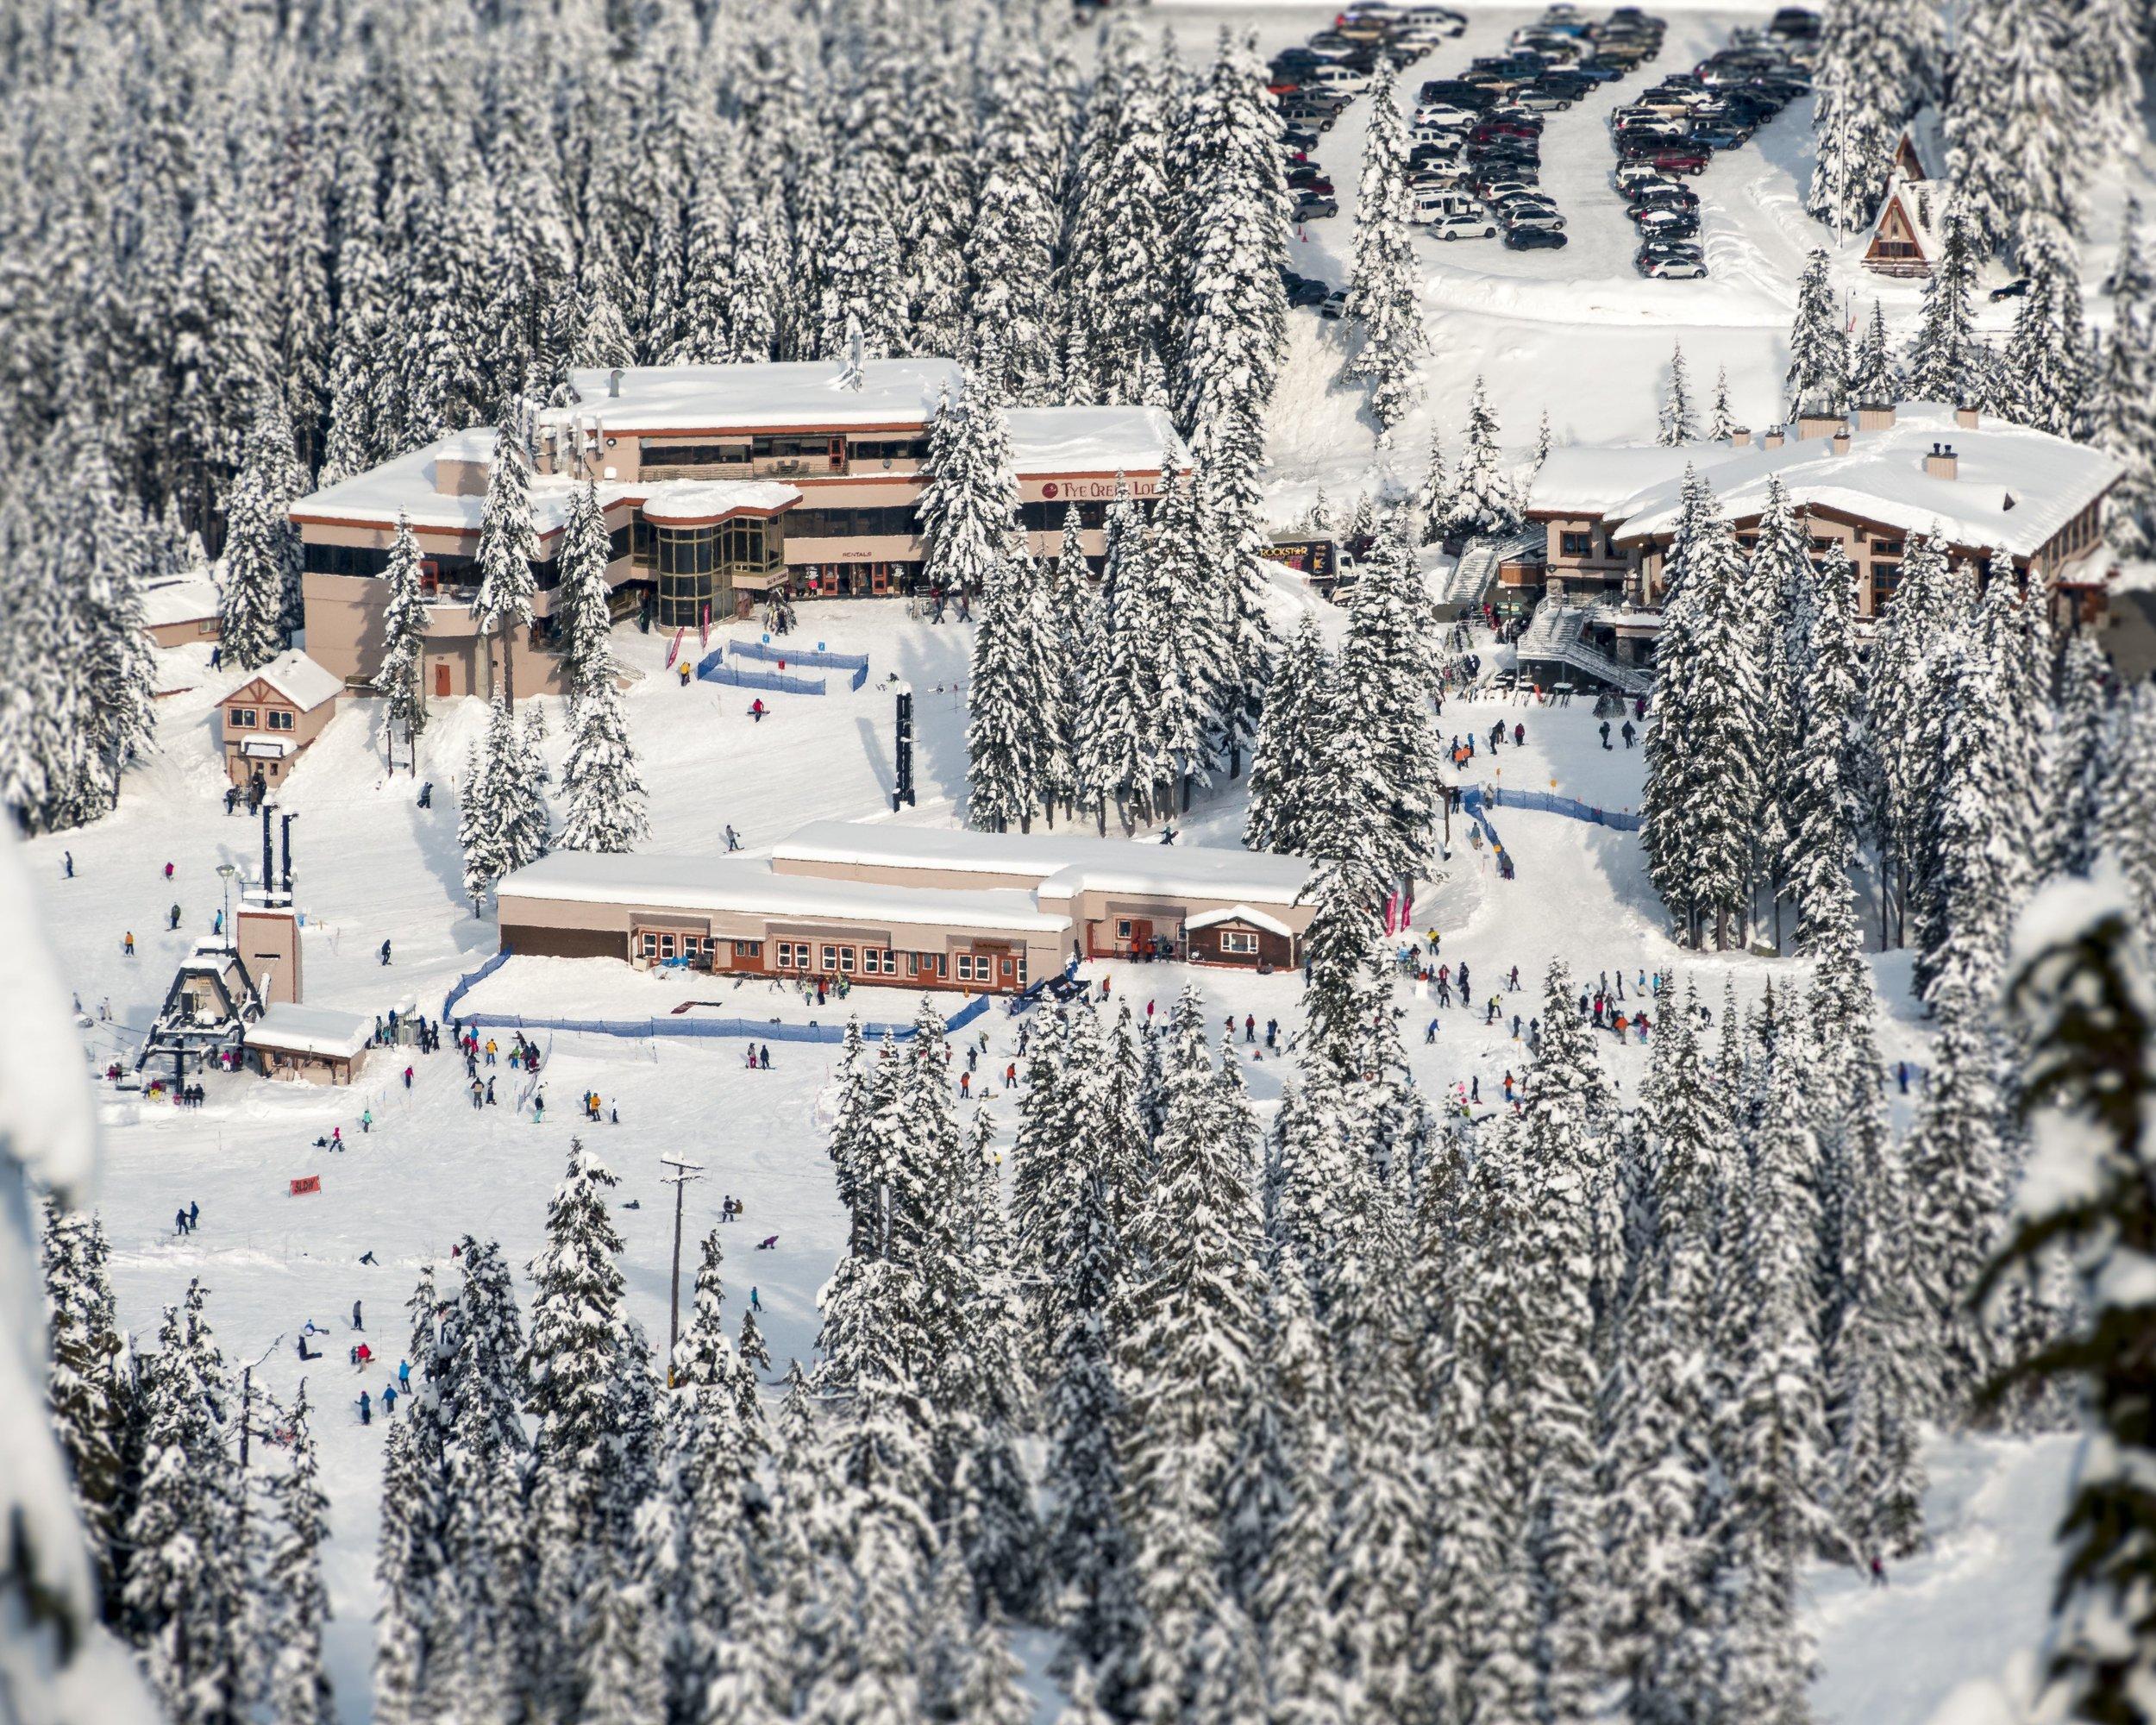 Winter_Mountain_Resort_Lodge_Base_Area.jpg